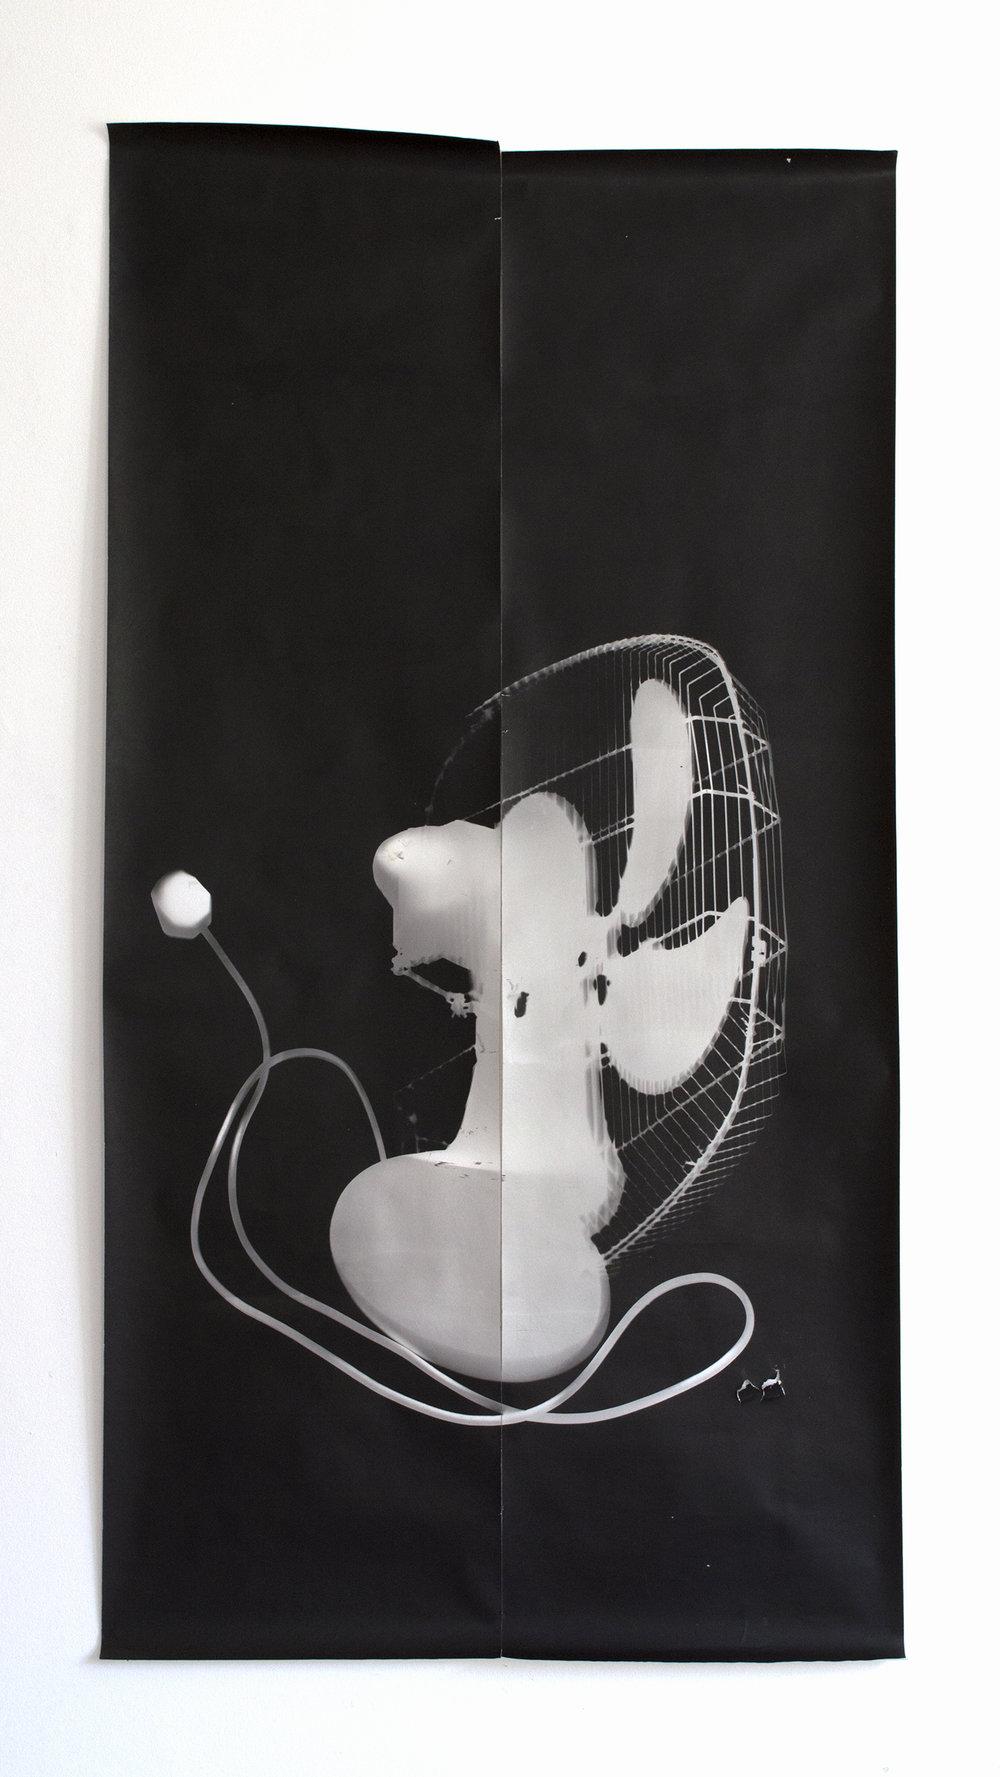 Photogram 69.2cm x 134cm